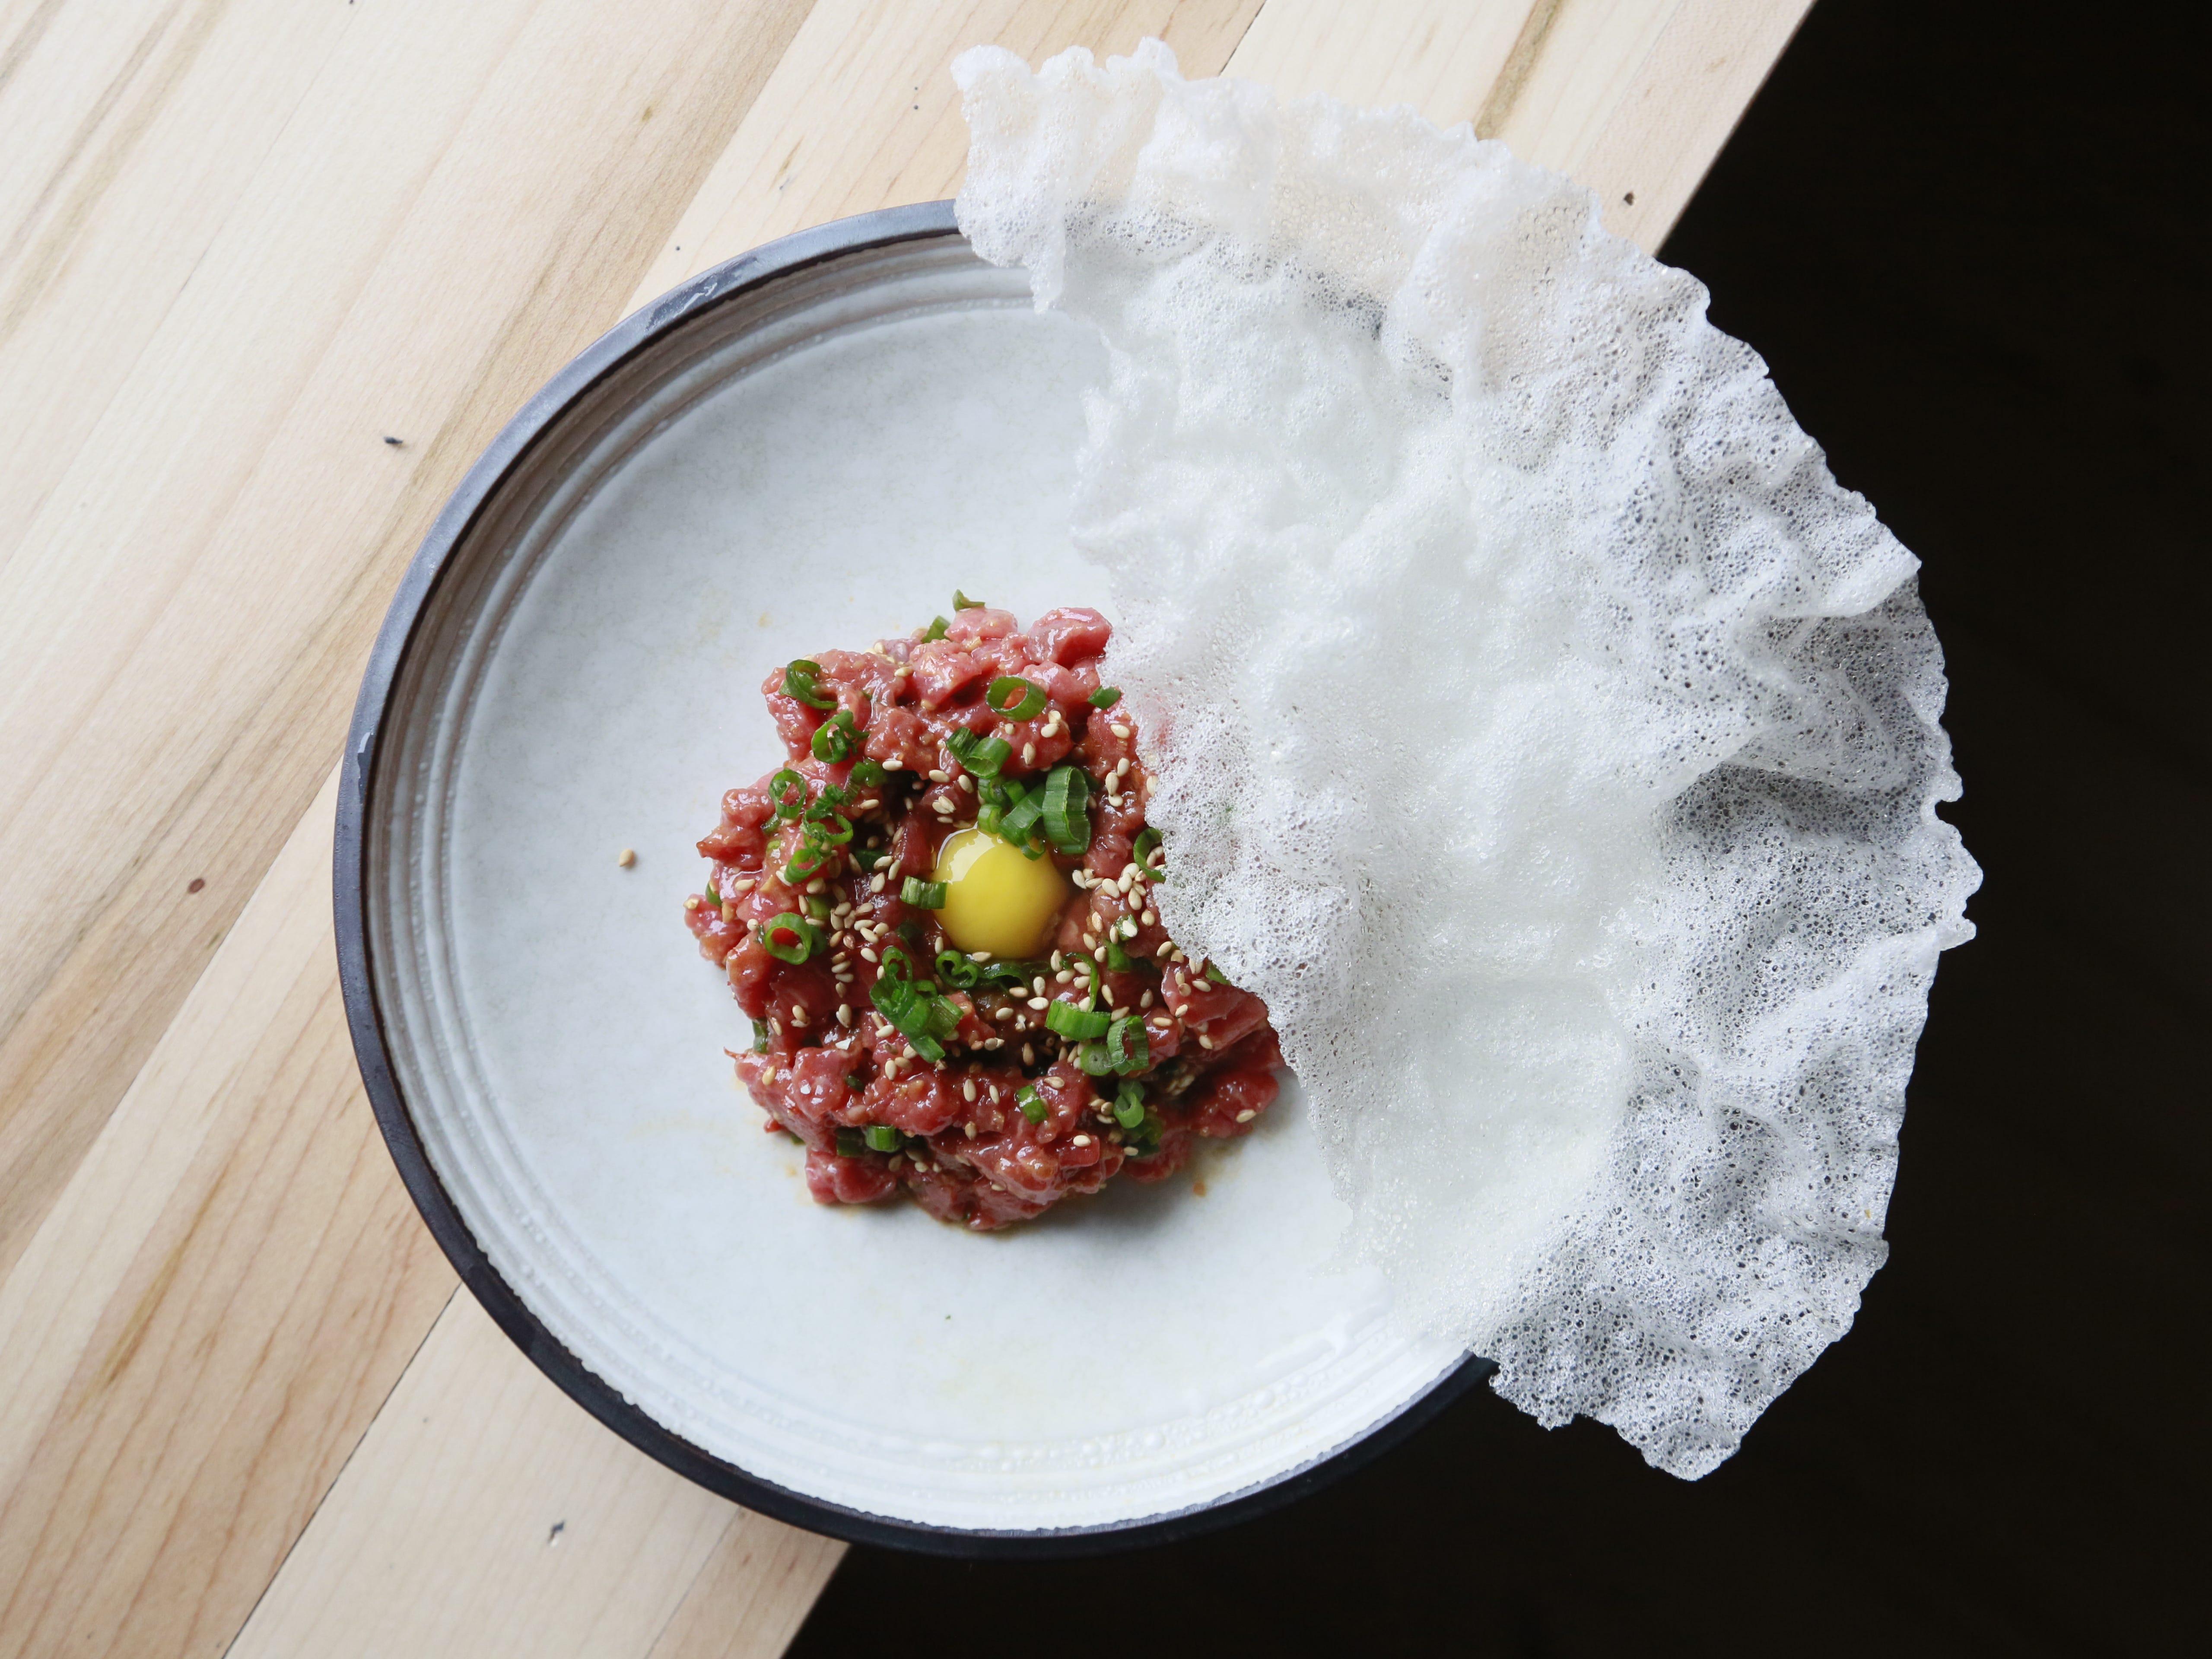 Long-delayed izakaya-style restaurant Antihero debuts in Ferndale on Thursday